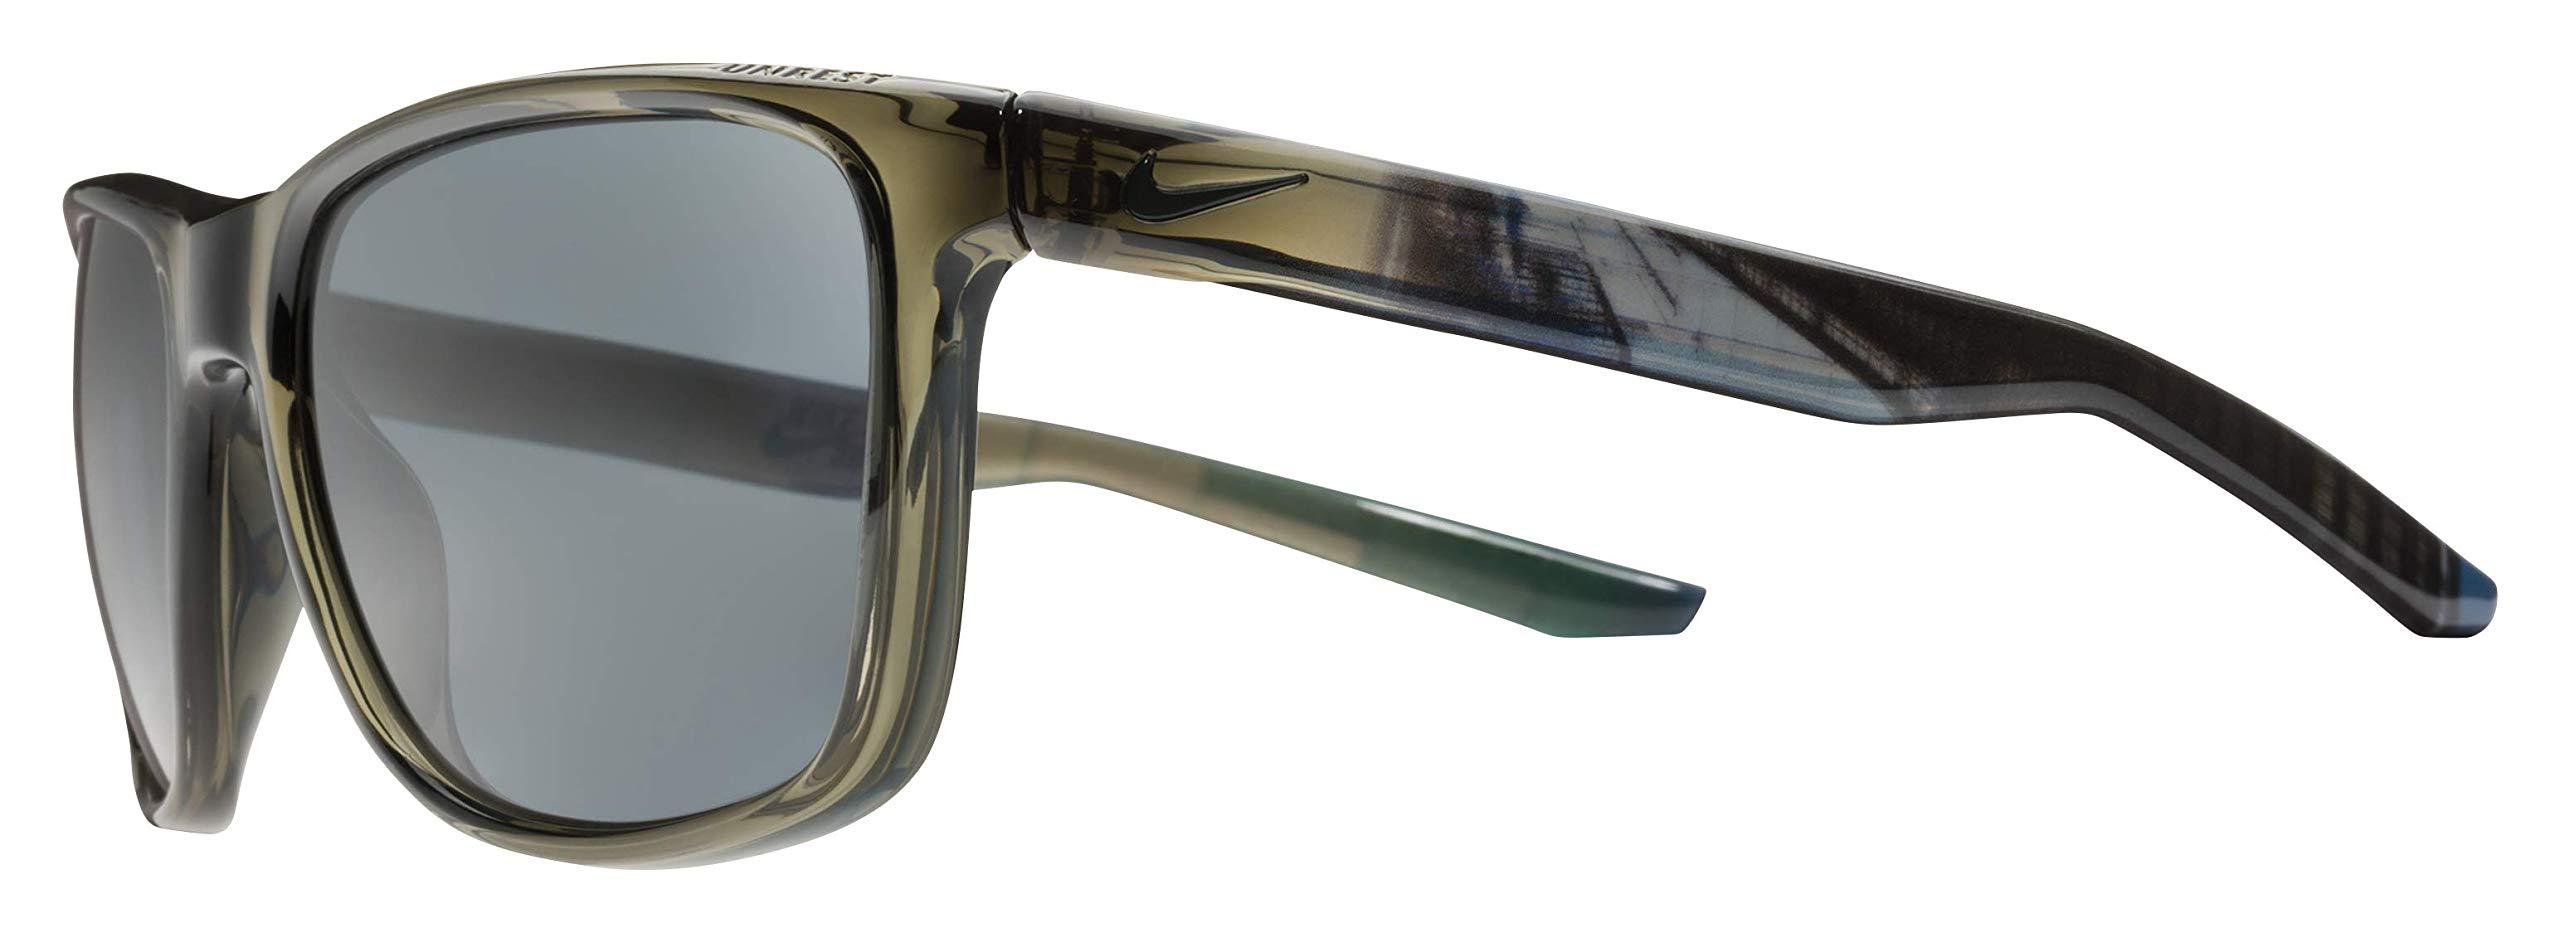 Nike Men's Unrest Se Rectangular Sunglasses, Crystal Cargo Khaki/Melbourne, 57 mm